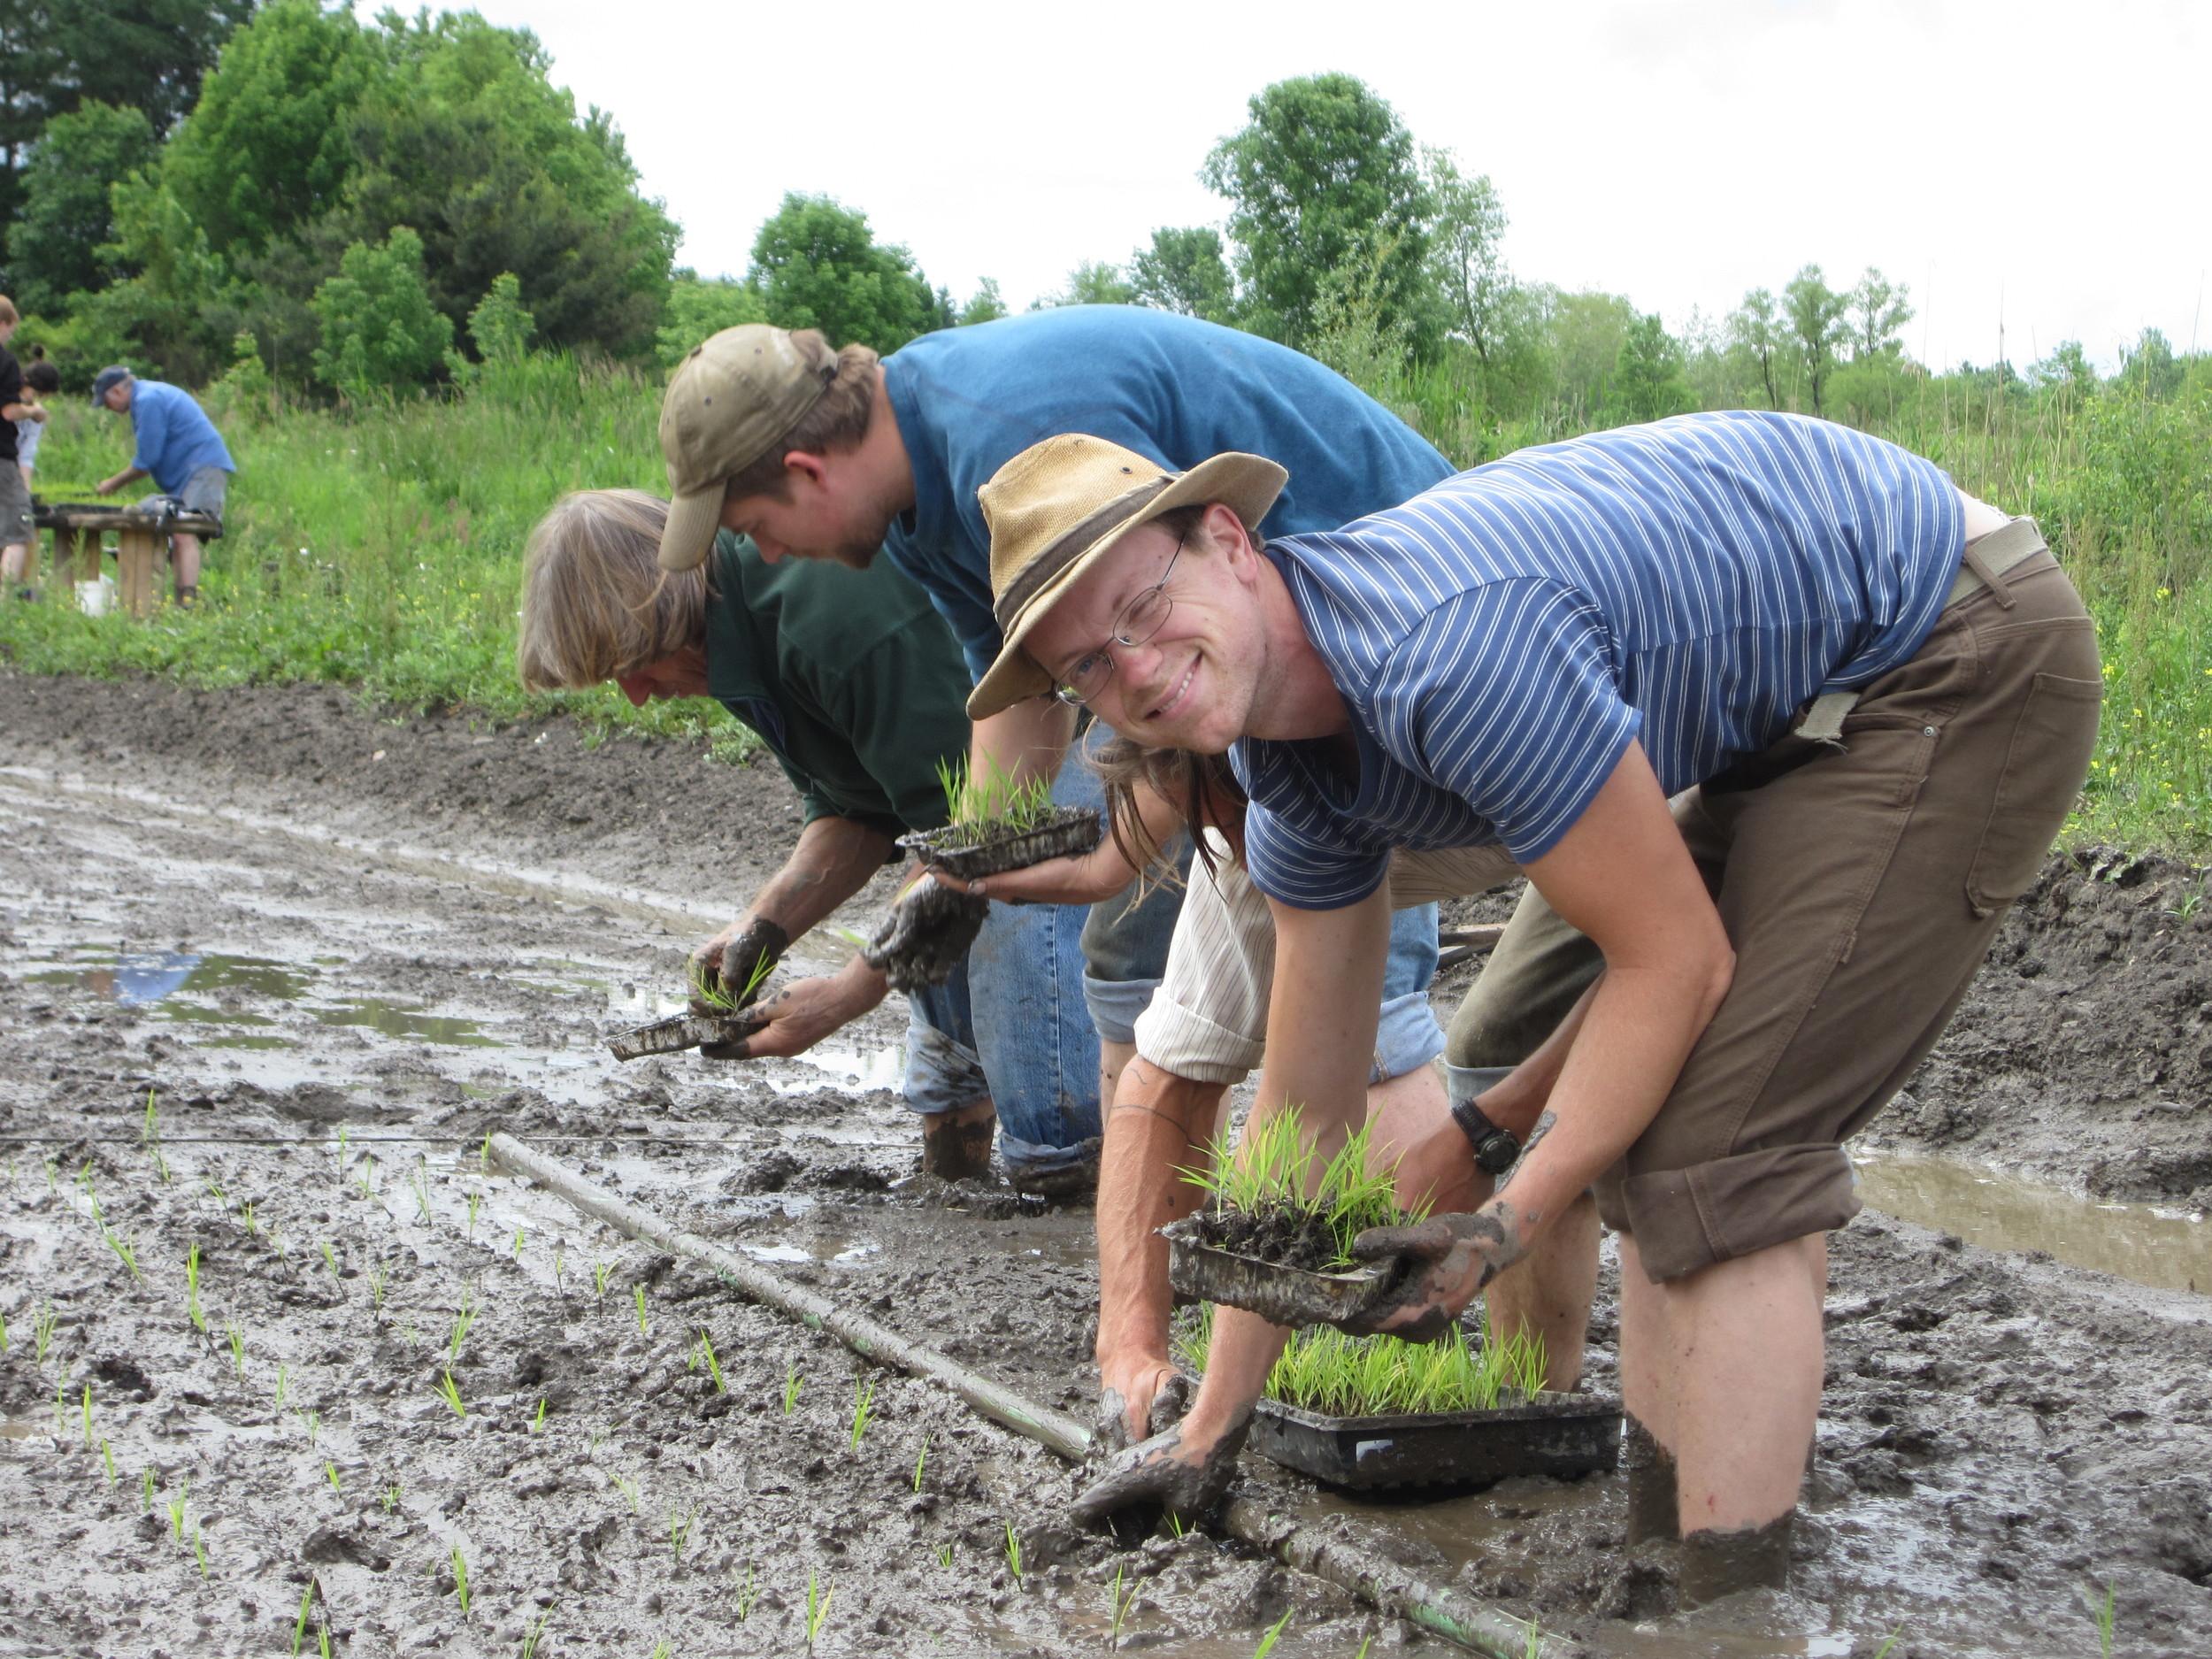 On planting day, friends help put in 4000+transplants of Yukihikari rice